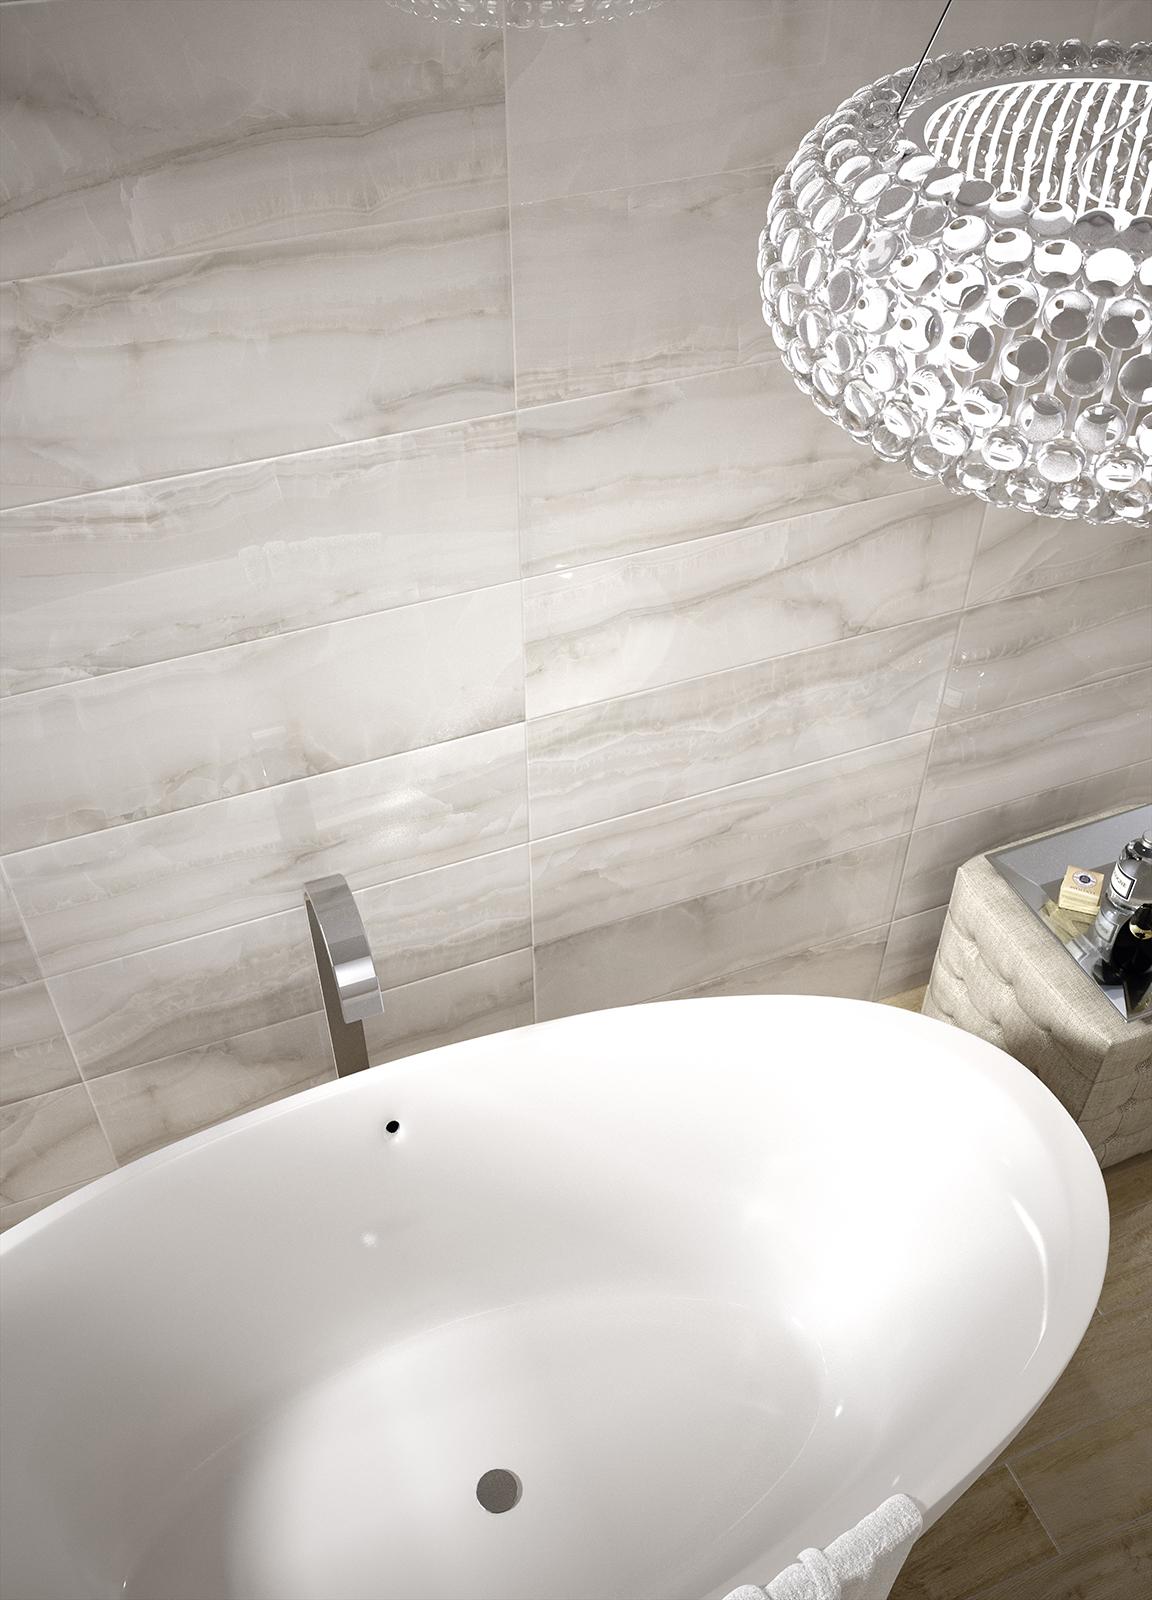 Onix Ceramic Tiles Marazzi_6166